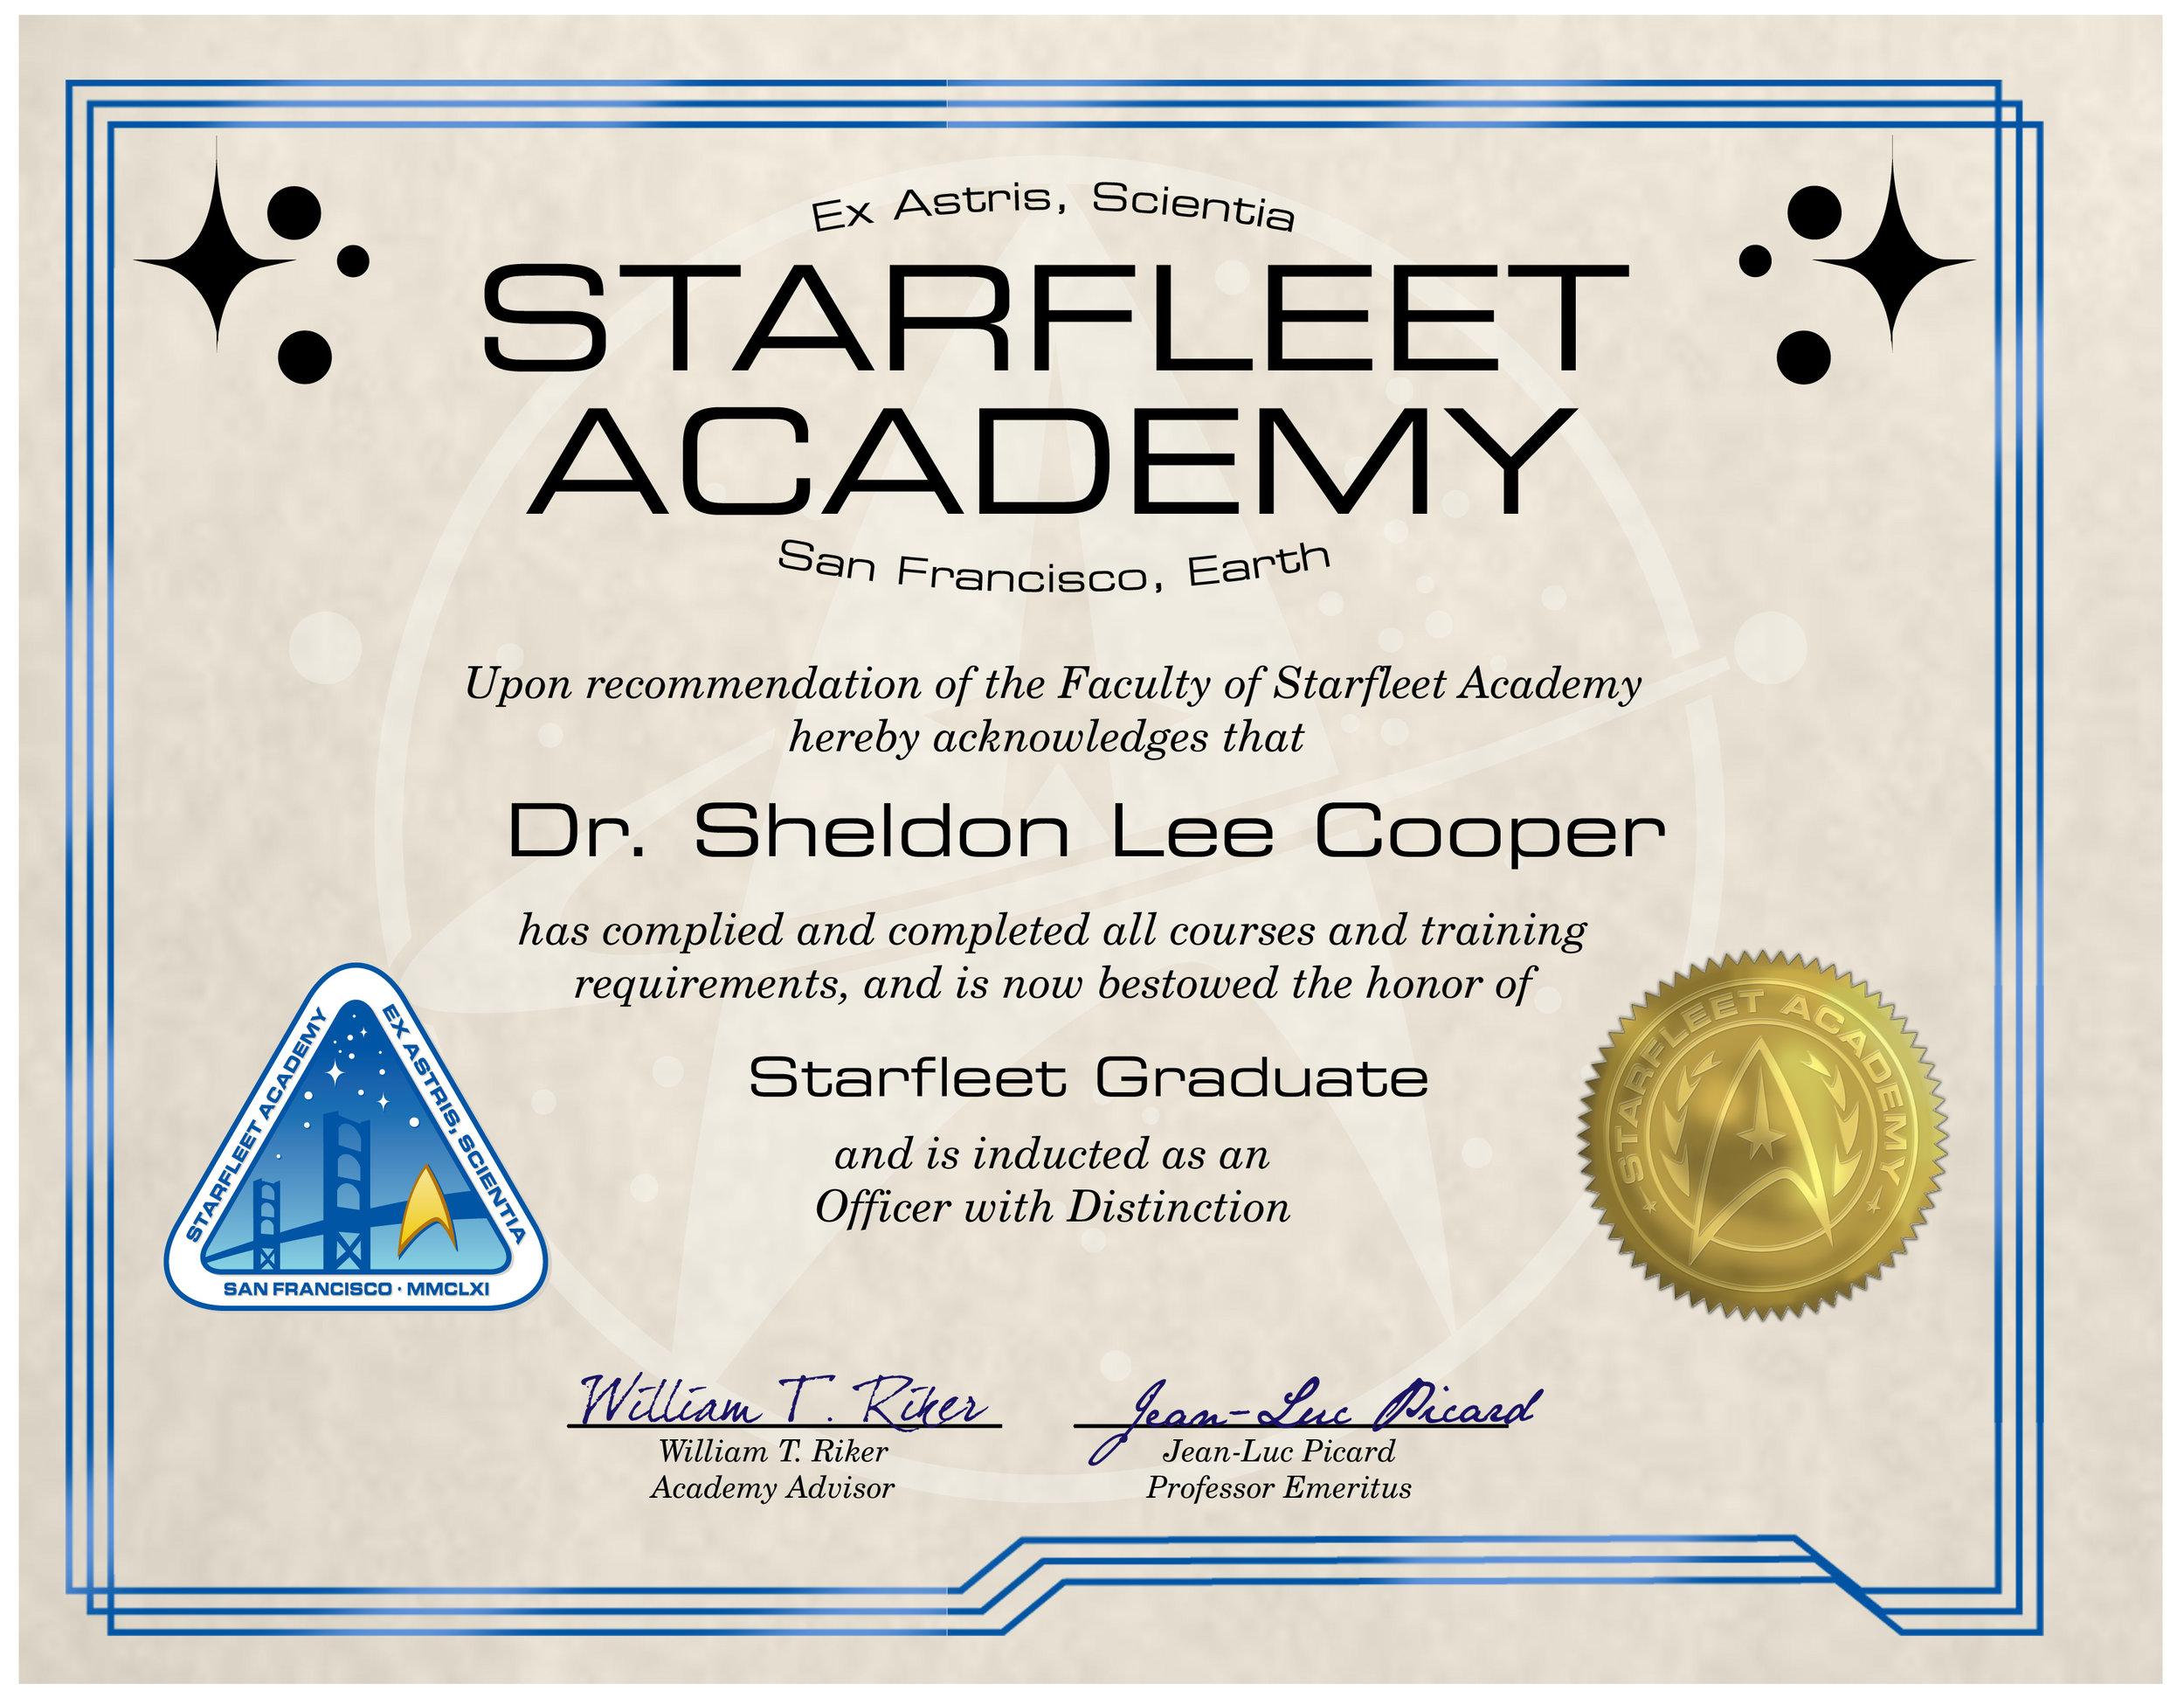 starfleet-academy-diploma-03.jpg